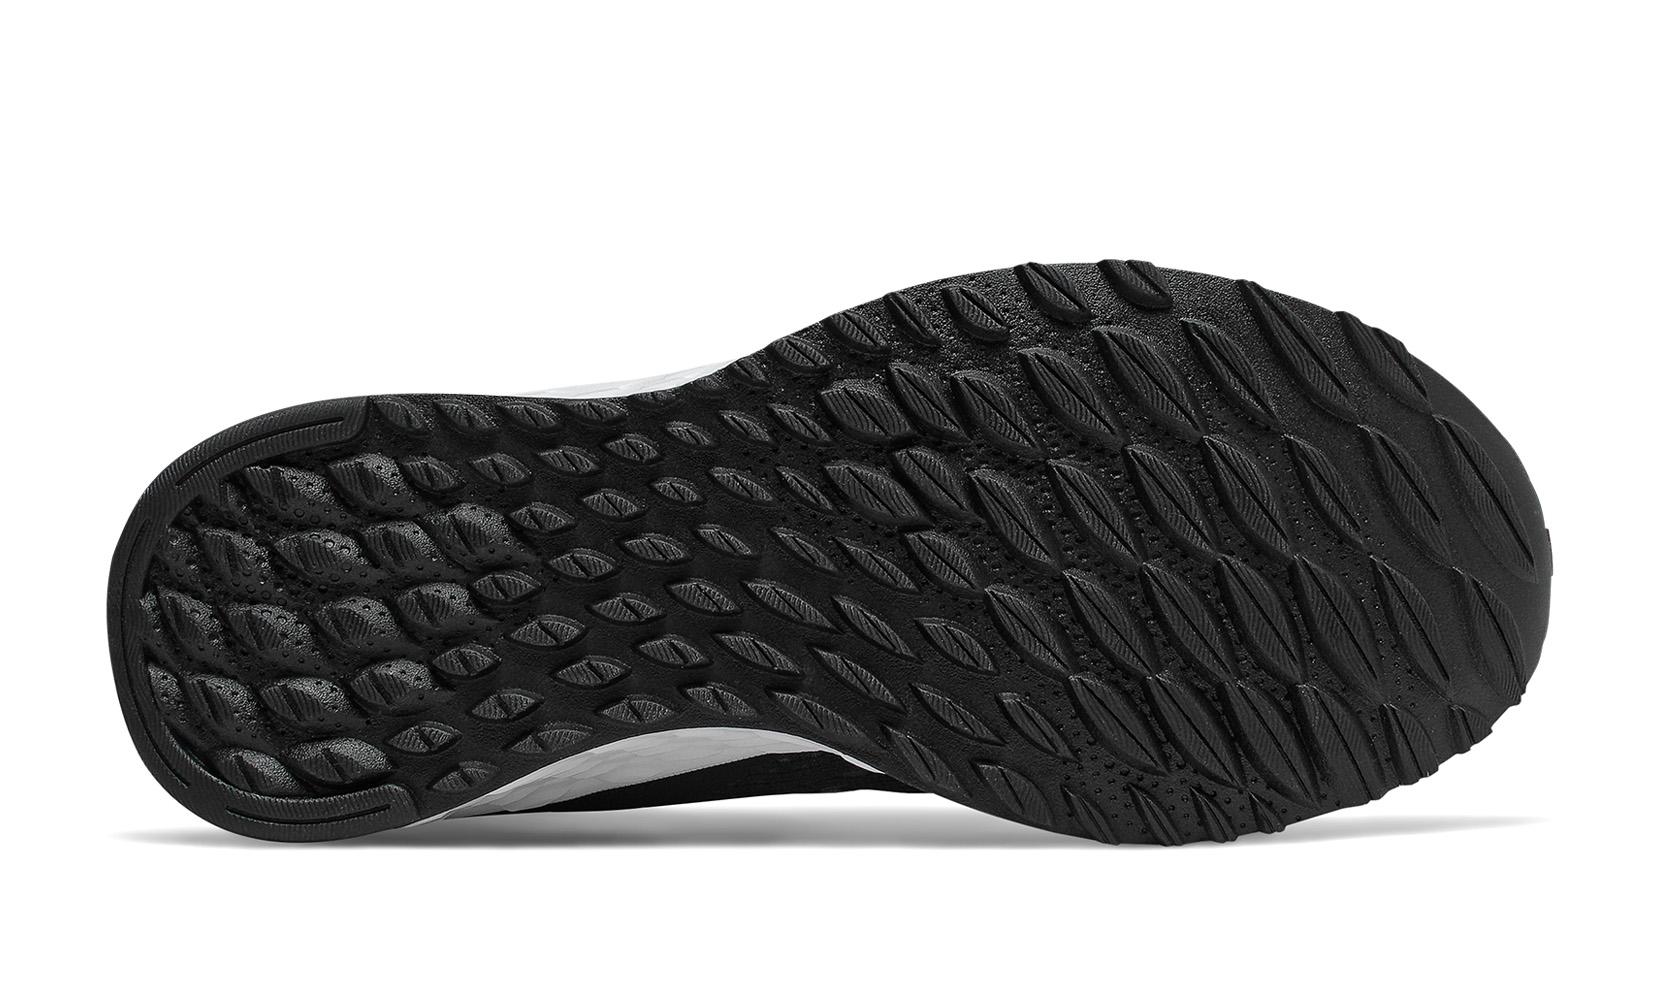 Жіноче взуття для бігу Fresh Foam Arishi V2 WARISLW2 | New Balance